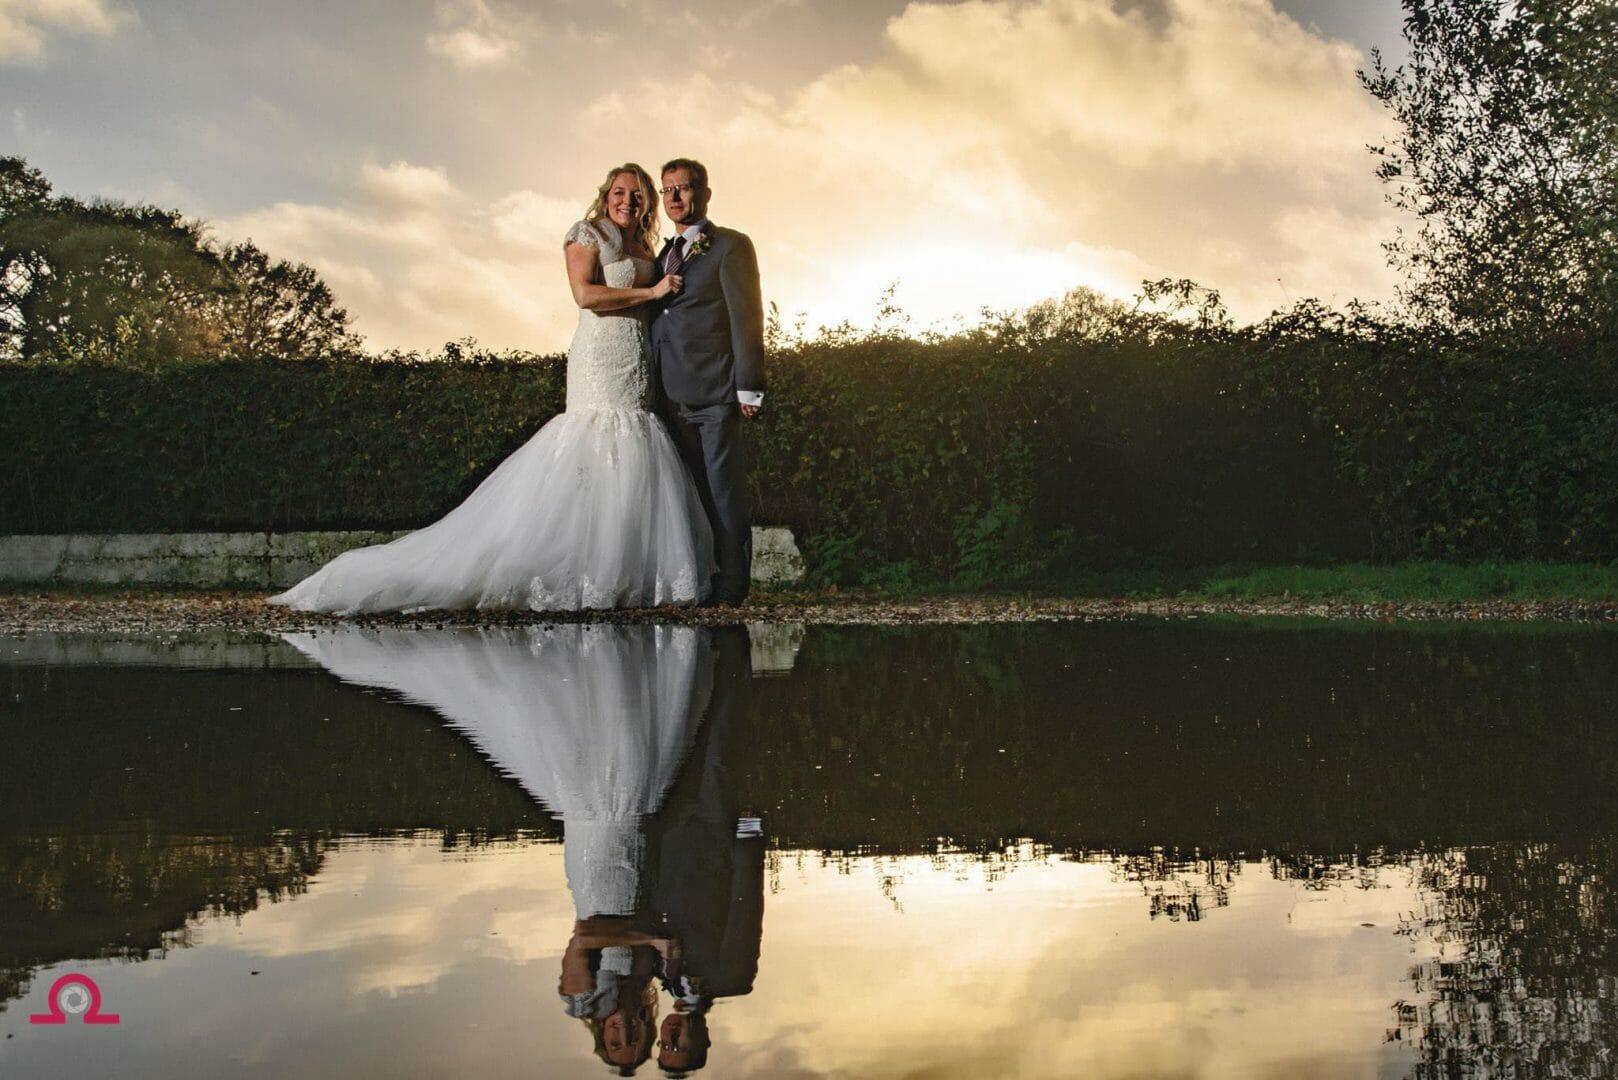 Reflection at a Christchurch wedding